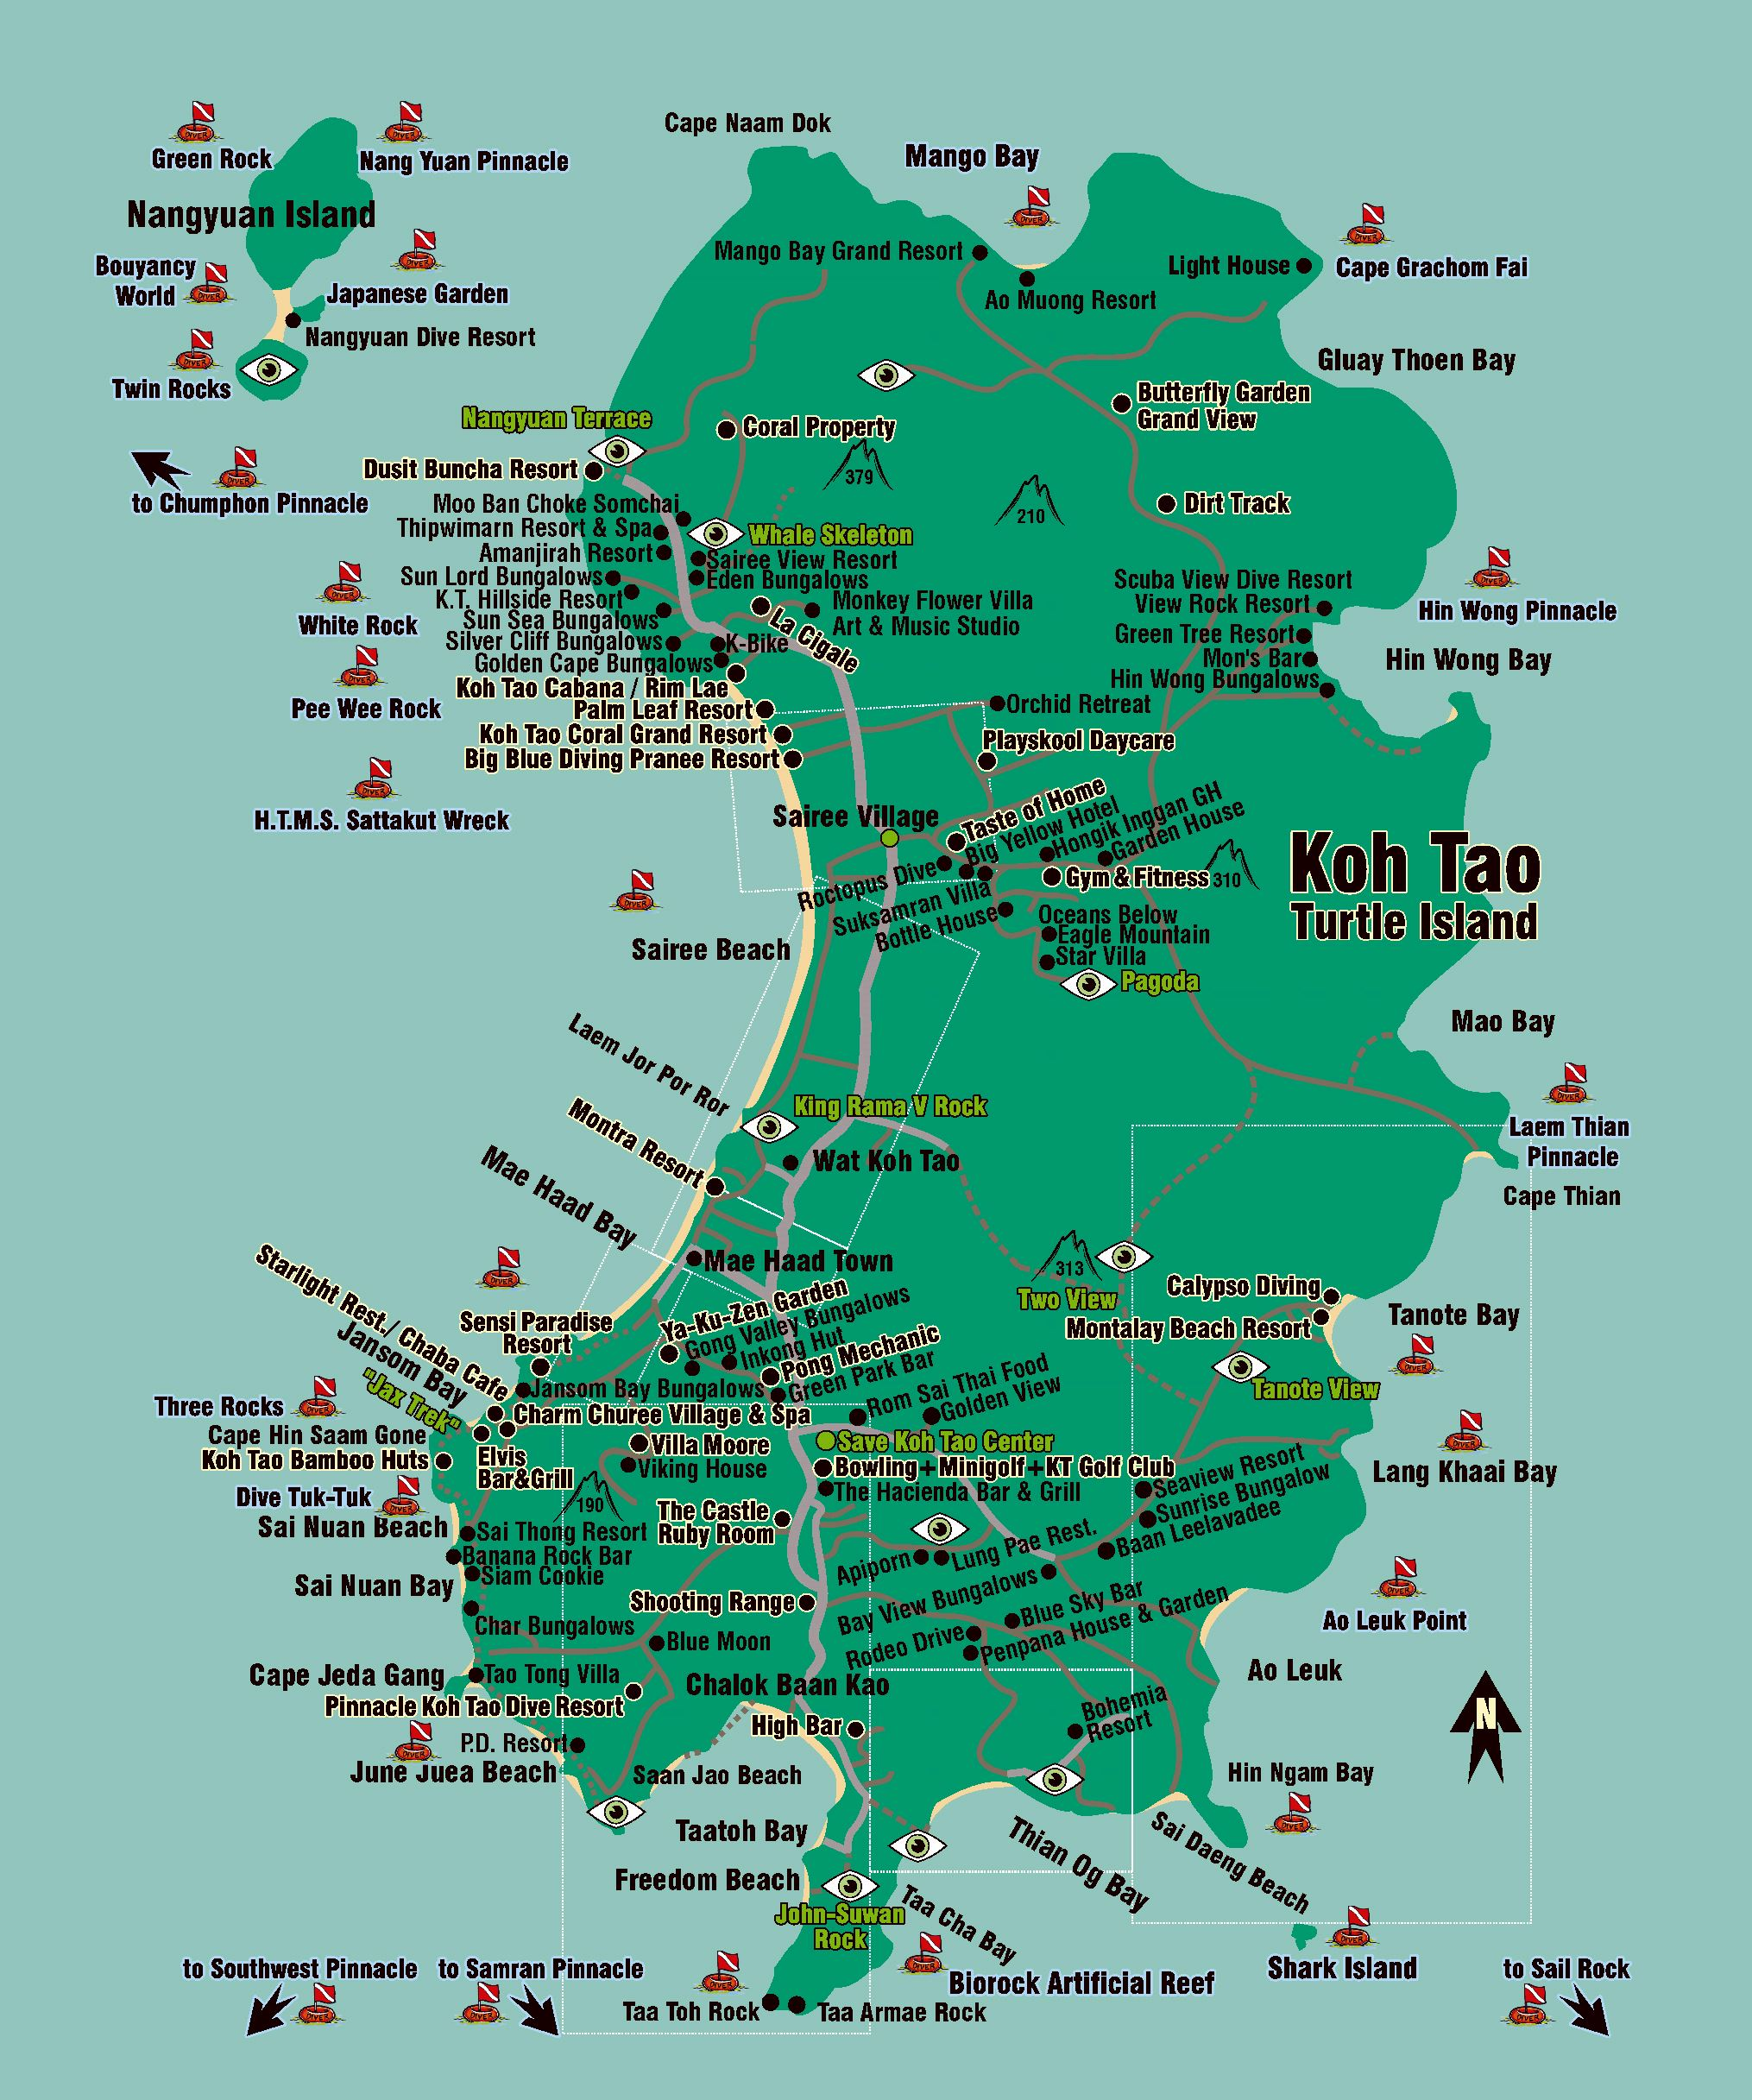 Large Ko Tao Island Maps for Free Download and Print | High ... on koh lanta thailand, koh samed thailand map, koh kood thailand map, koh phi phi thailand map, bophut thailand map, chiang mai thailand map, koh kut thailand map, cha-am thailand map, krabi thailand map, ancient china han empire map, kuala lumpur thailand map, koh nang yuan thailand map, nakhon phanom thailand map, suratthani thailand map, satun thailand map, pattaya thailand map, mae sai thailand map, pee pee island thailand map, koh kradan thailand map, cebu taoist temple map,